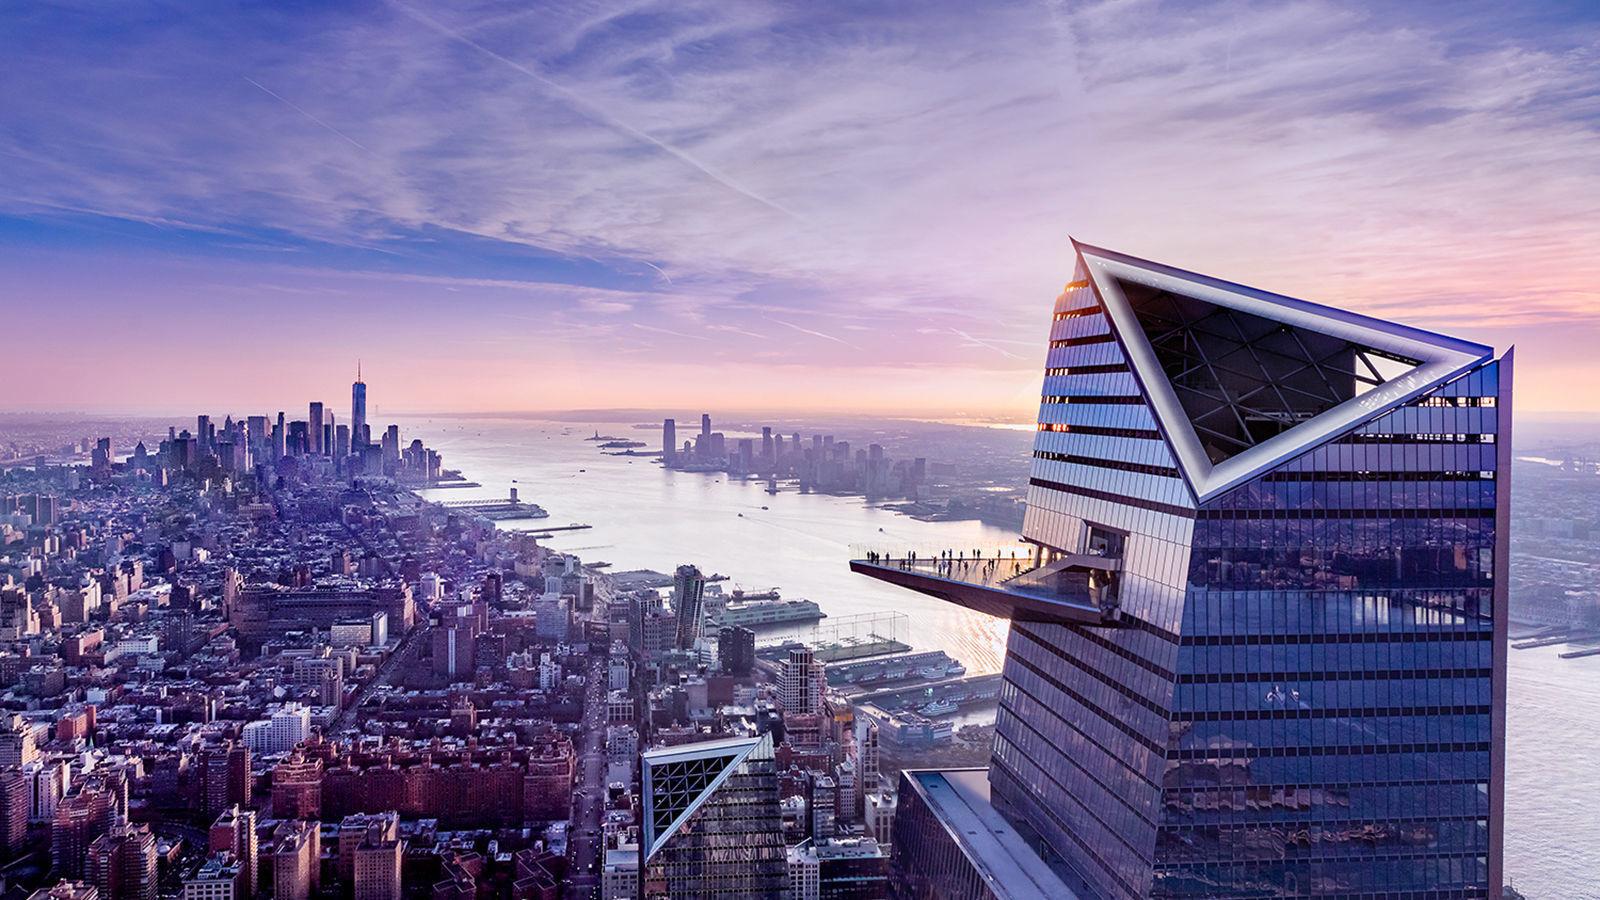 Highest sky deck in Western Hemisphere takes visitors to edge in New York